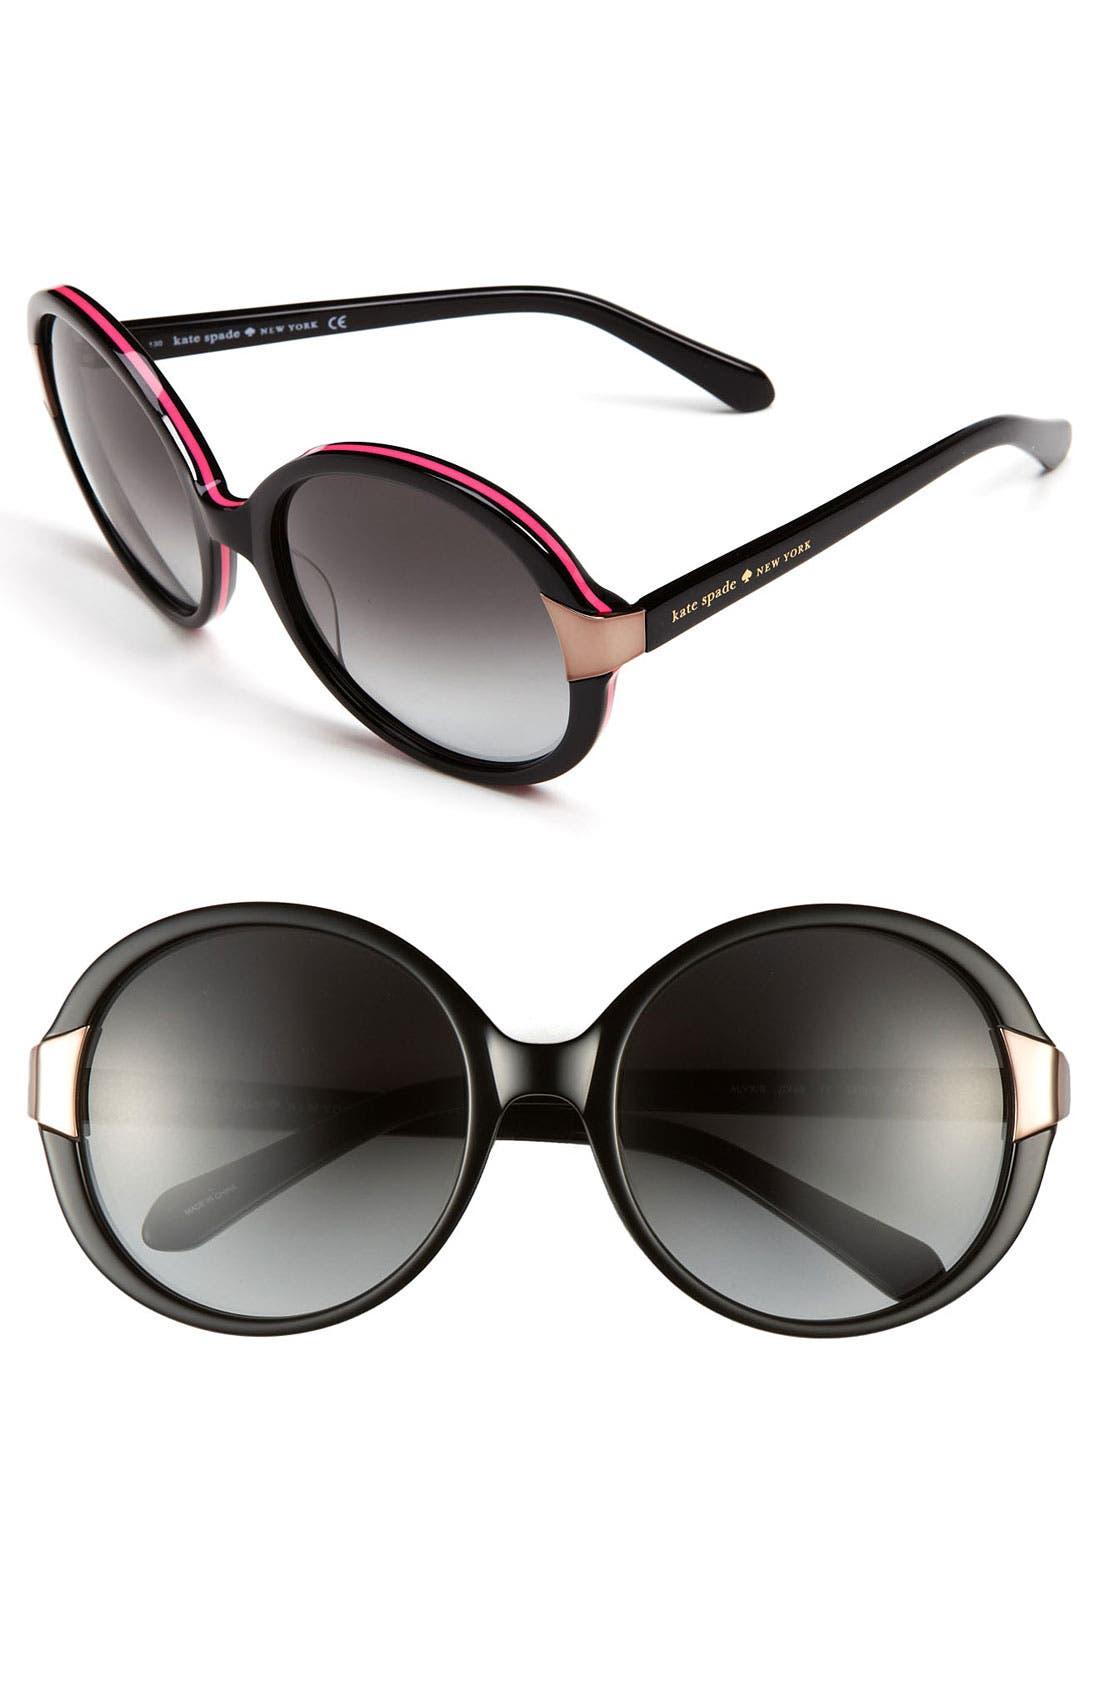 Main Image - kate spade new york 'alyx' 56mm oversized sunglasses